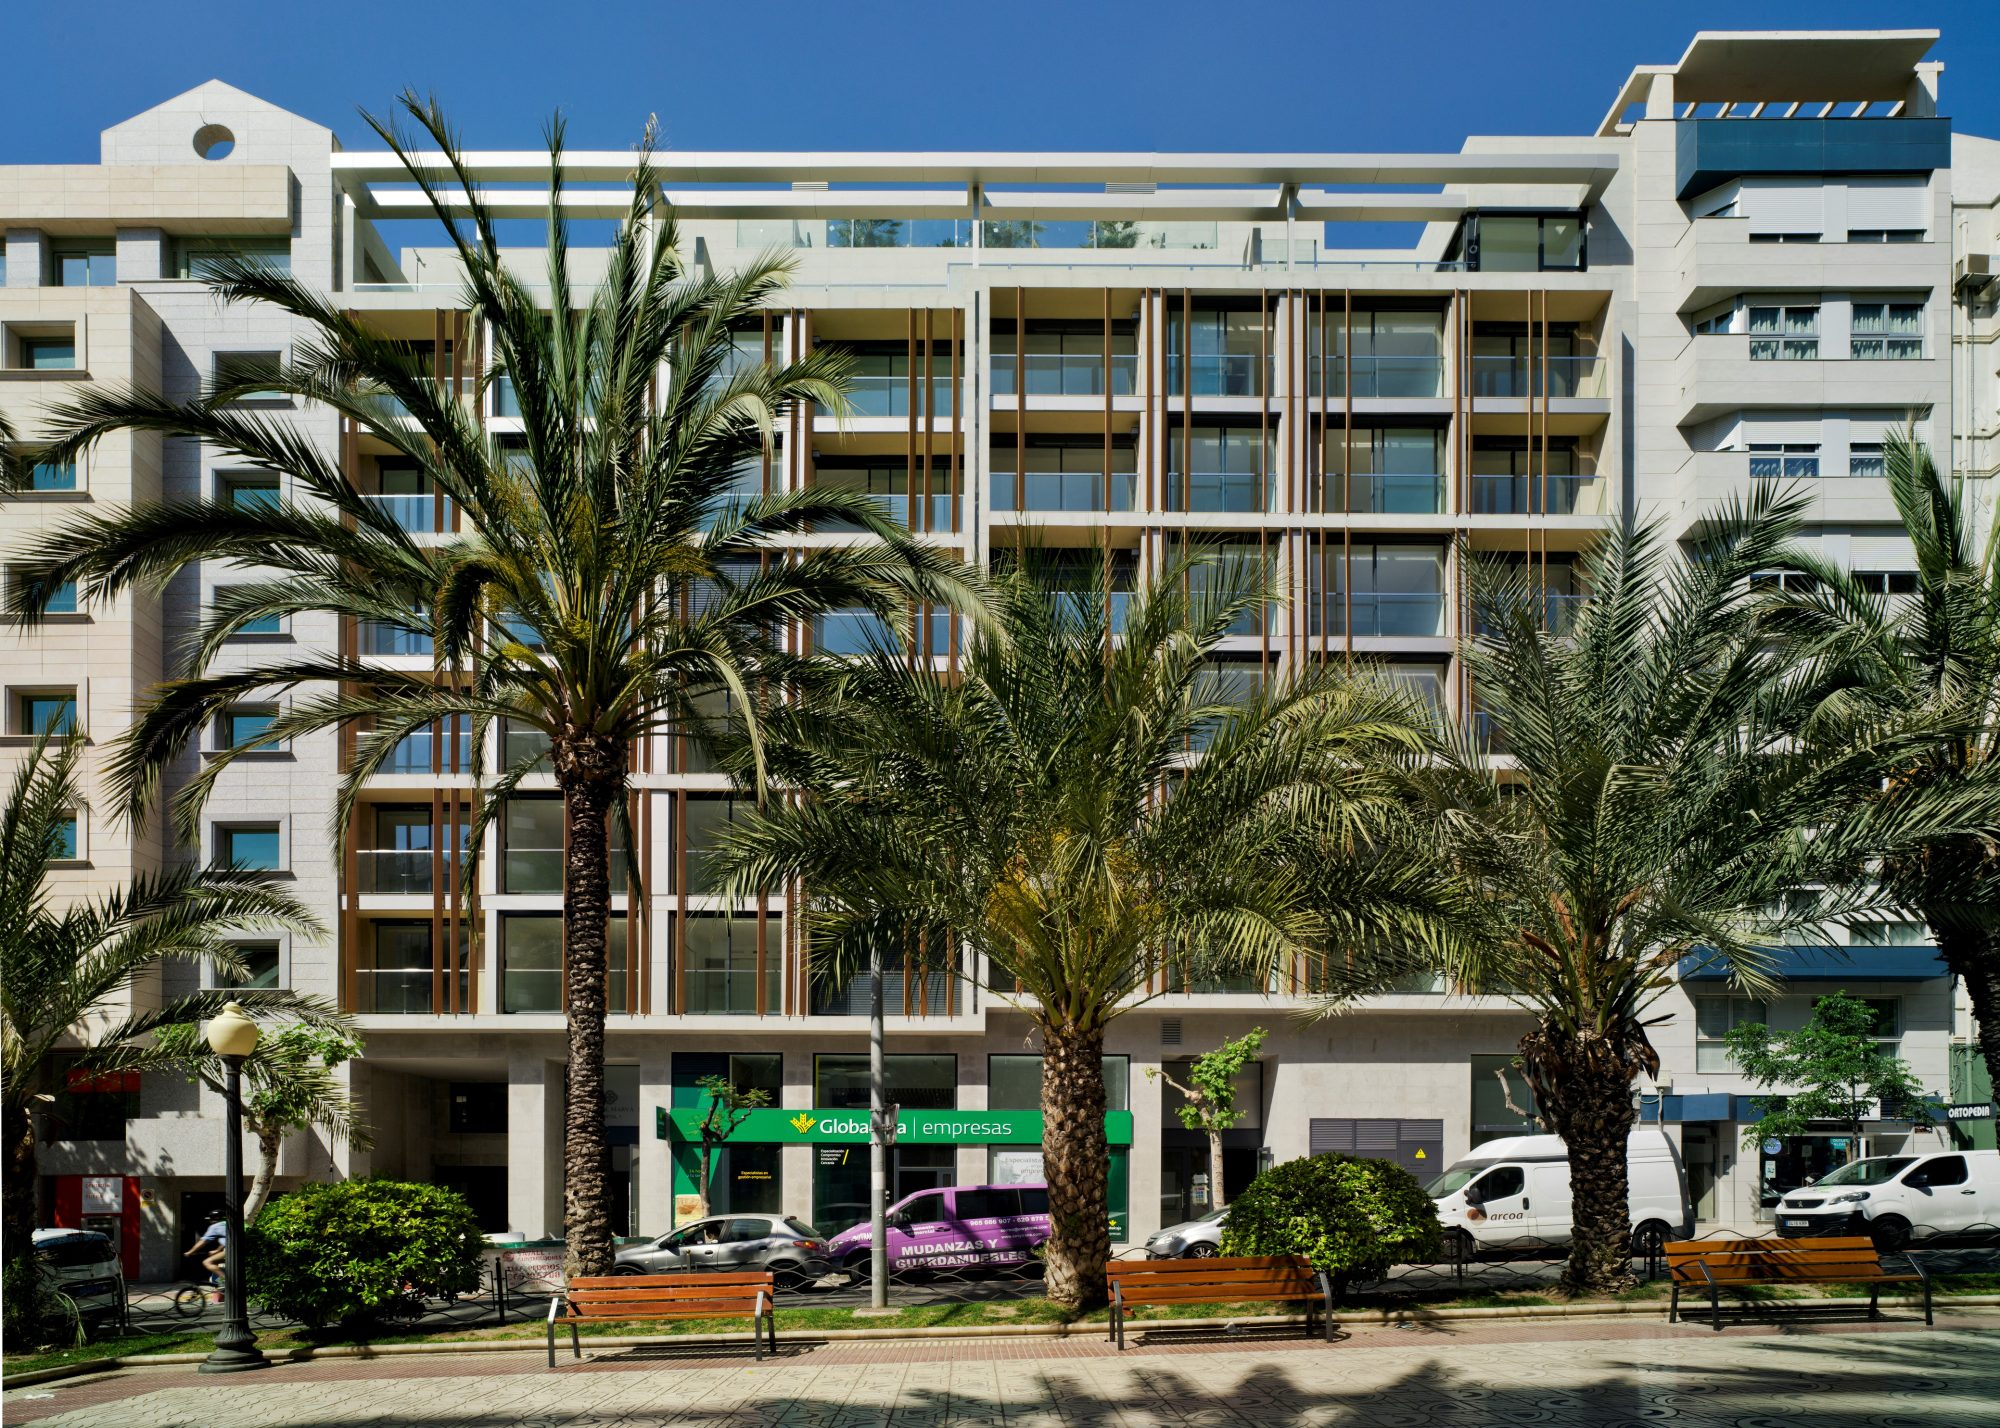 Façade de l'immeuble neuf Alicante Centre